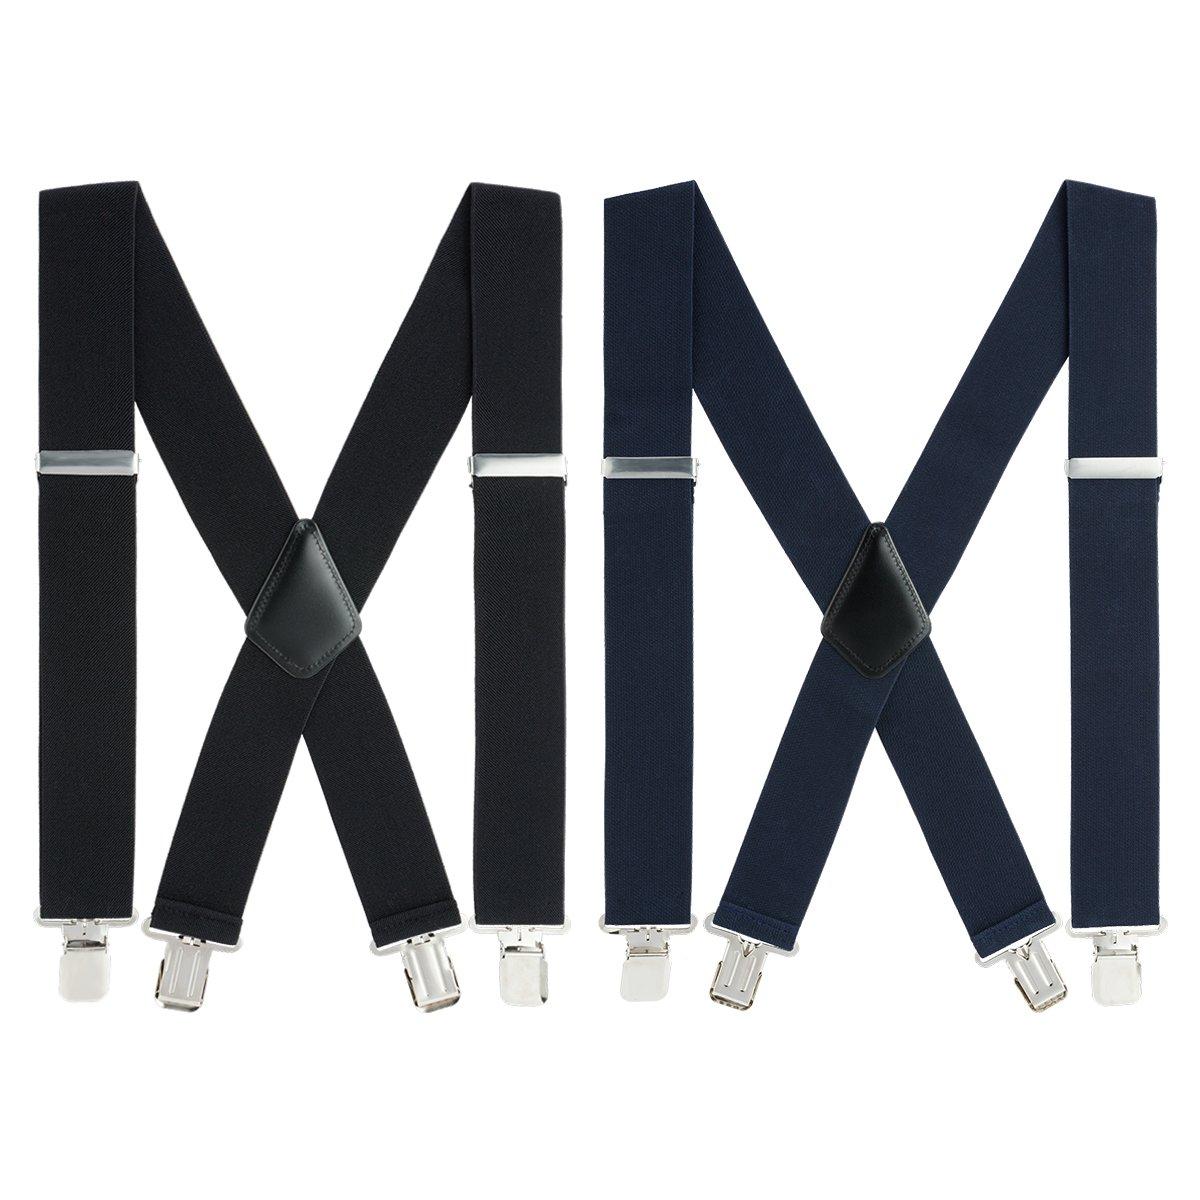 Mens X-Back Heavy Duty Work Suspenders 2pc Adjustable Elastic Clip Suspenders (Black/Navy Blue) One Size by GradeCode (Image #1)